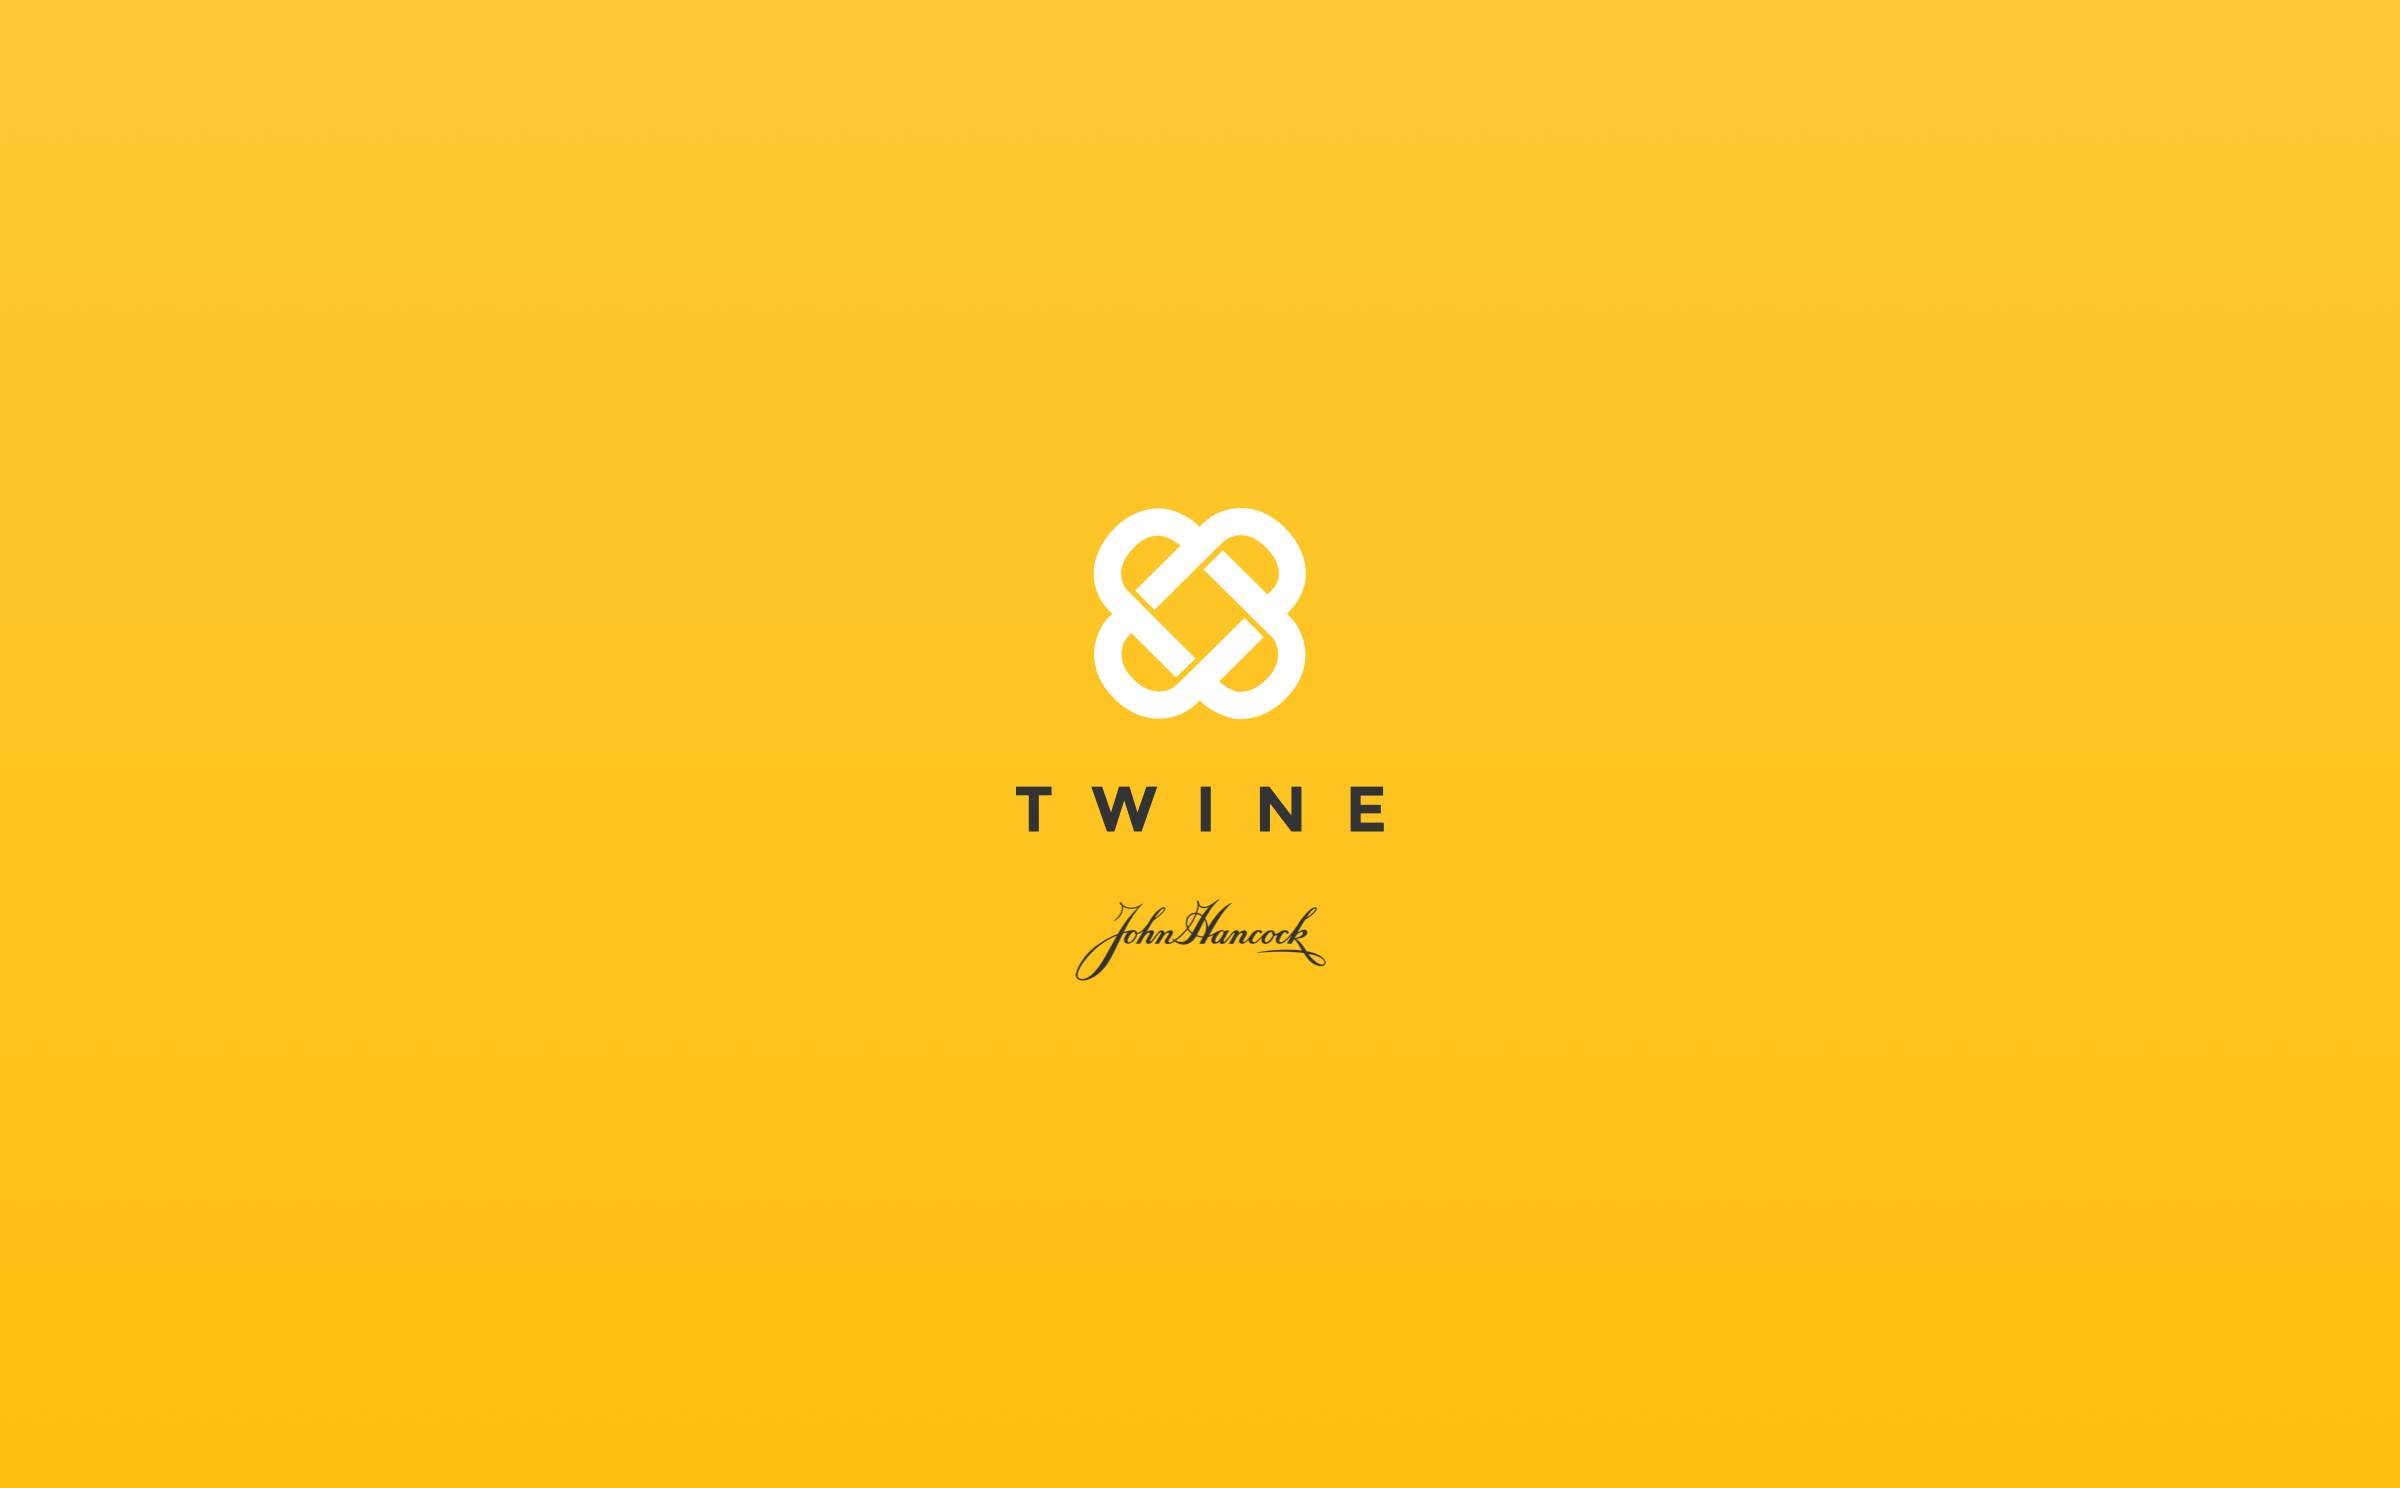 Twine_logo.png